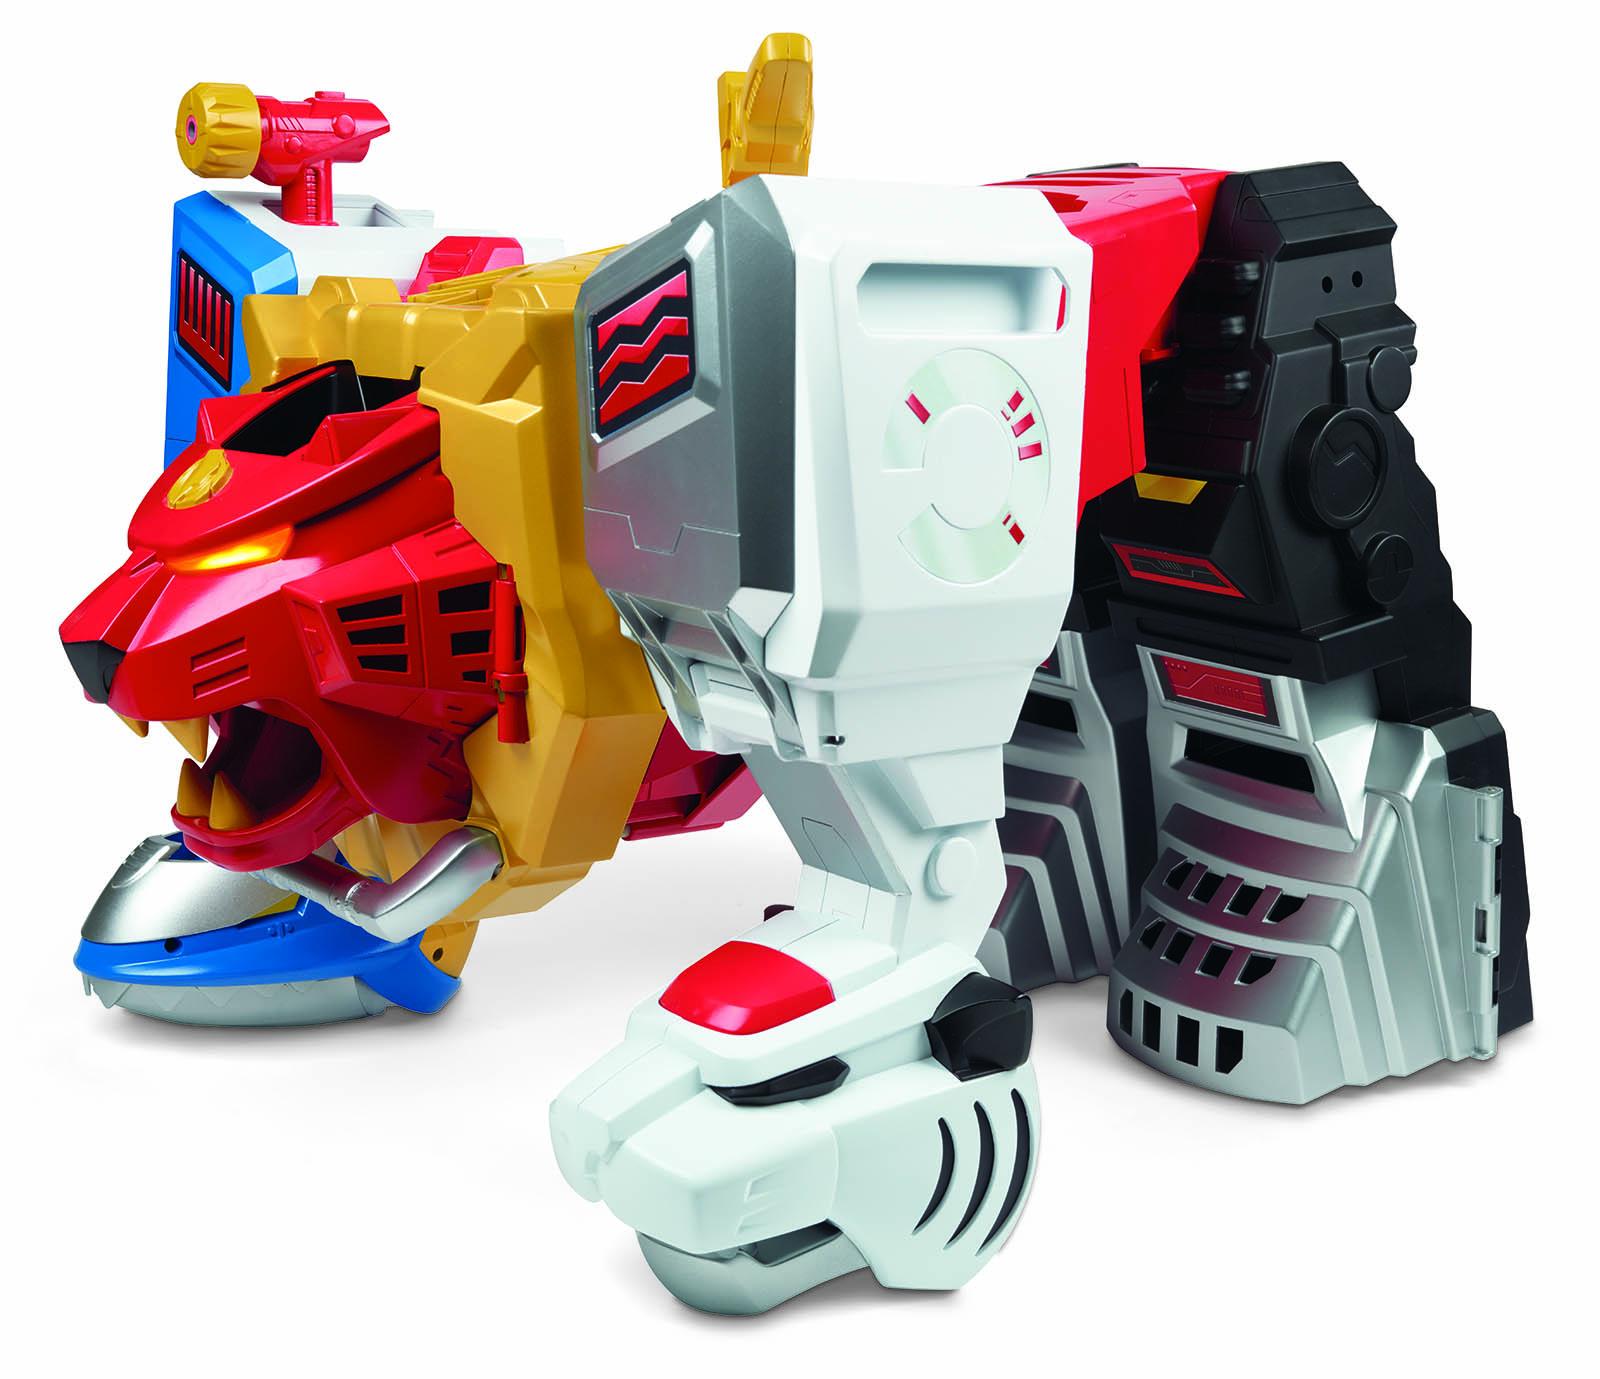 Hasbro announces Power Rangers Beast Morphers Figures